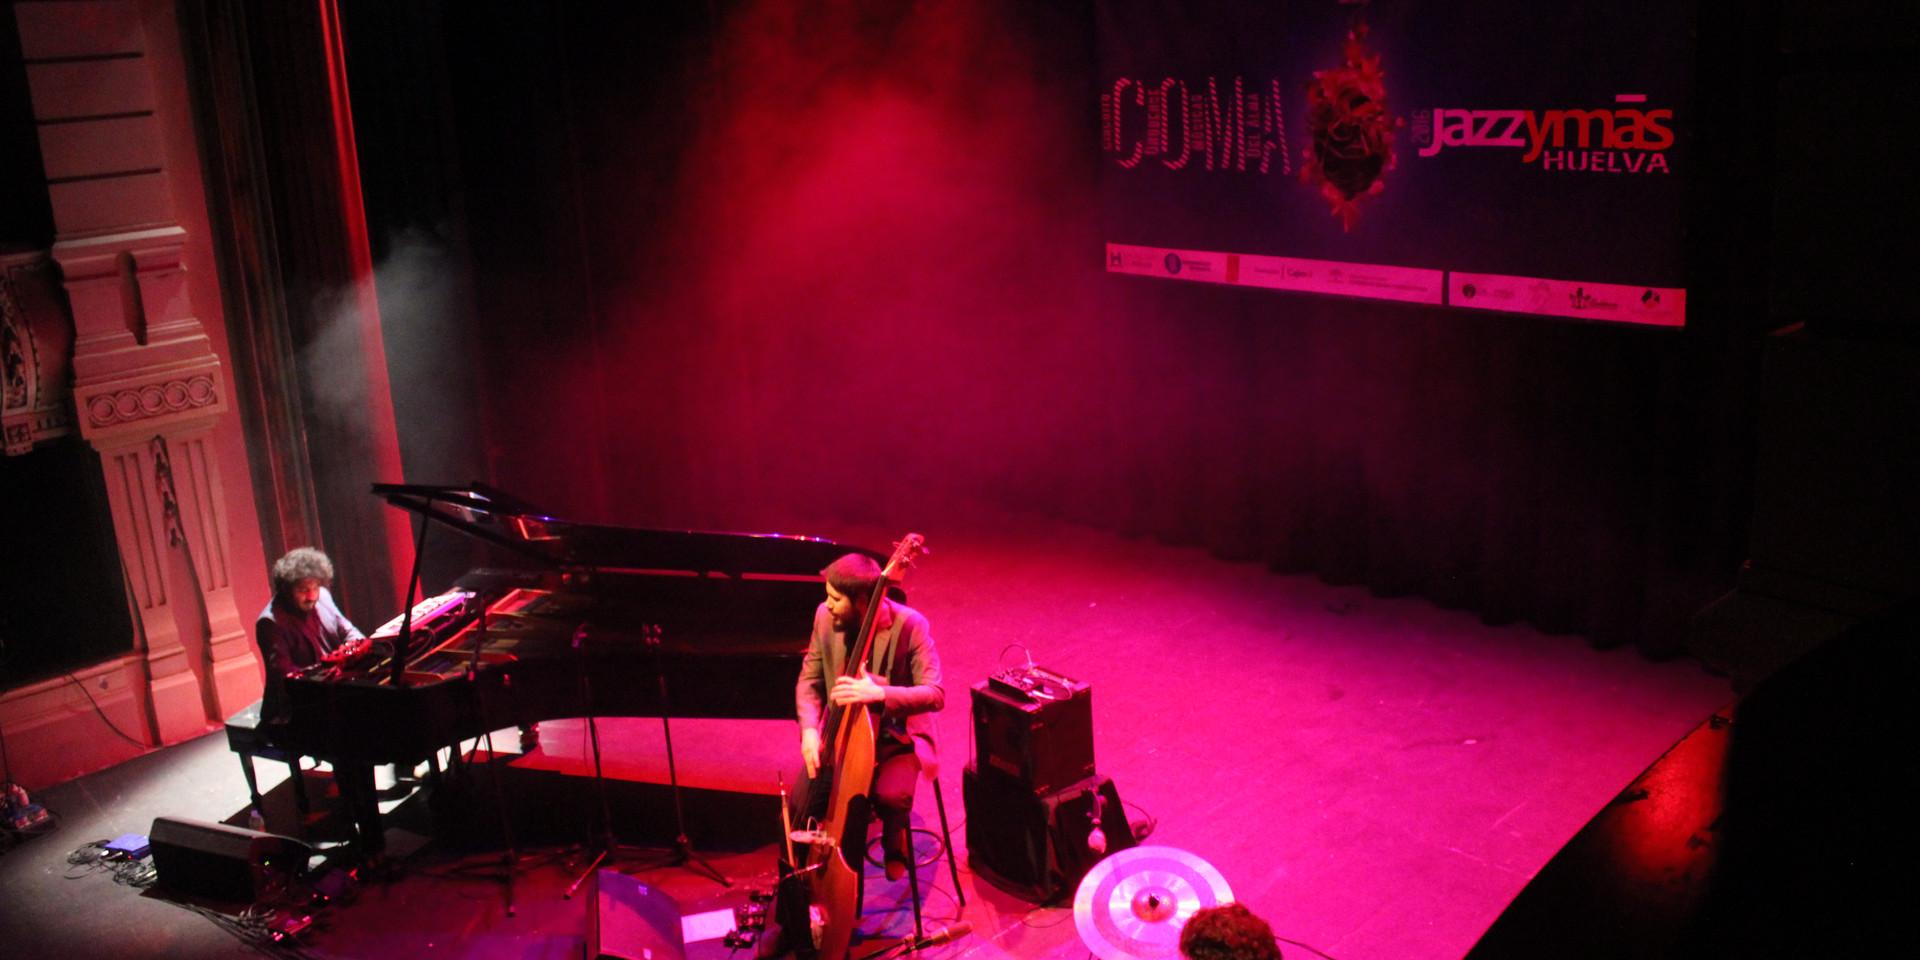 Festival Jazzymas (Huelva)